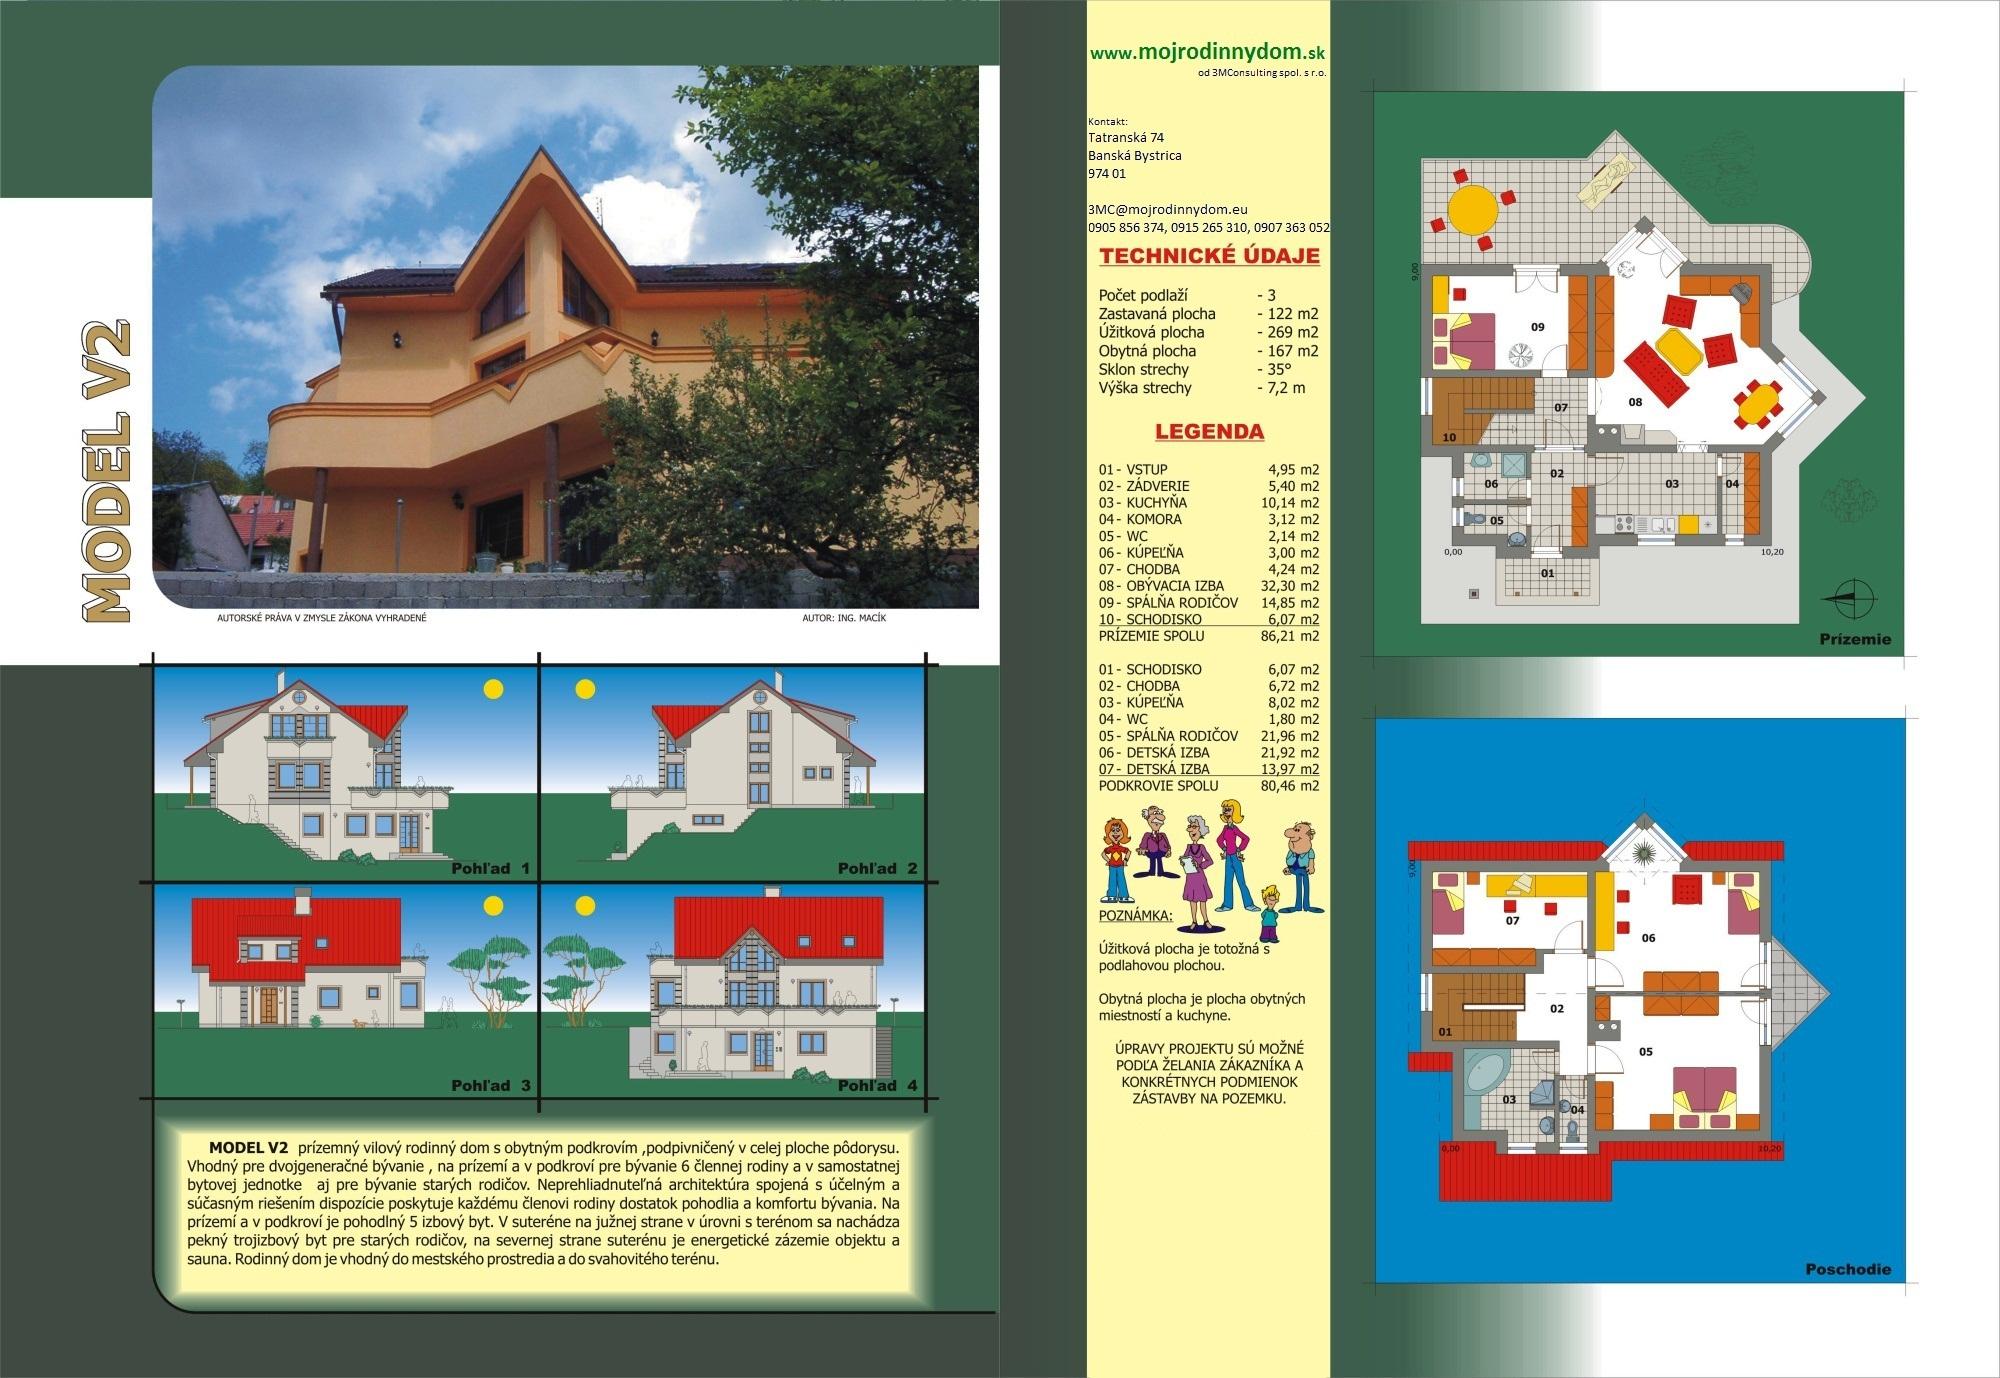 projekt veľkého rodinného domu xv2